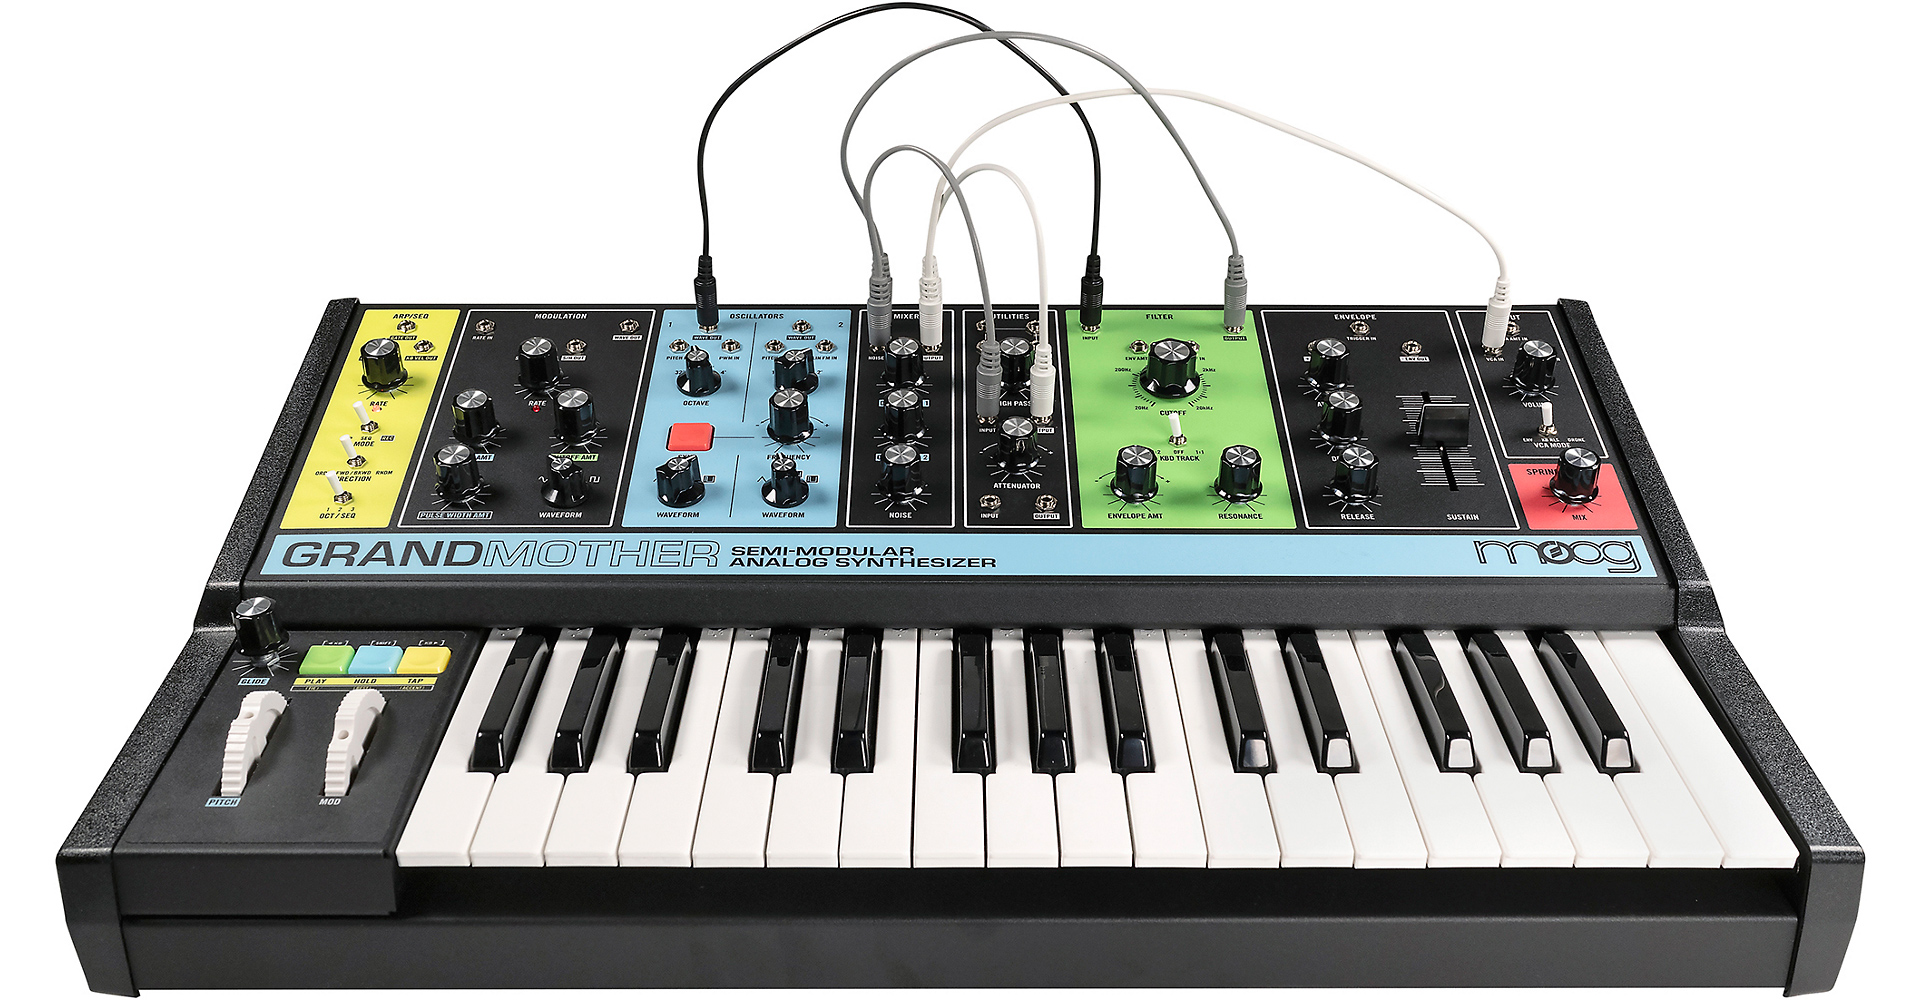 All the details on Moog's new Grandmother semi-modular synth - CDM